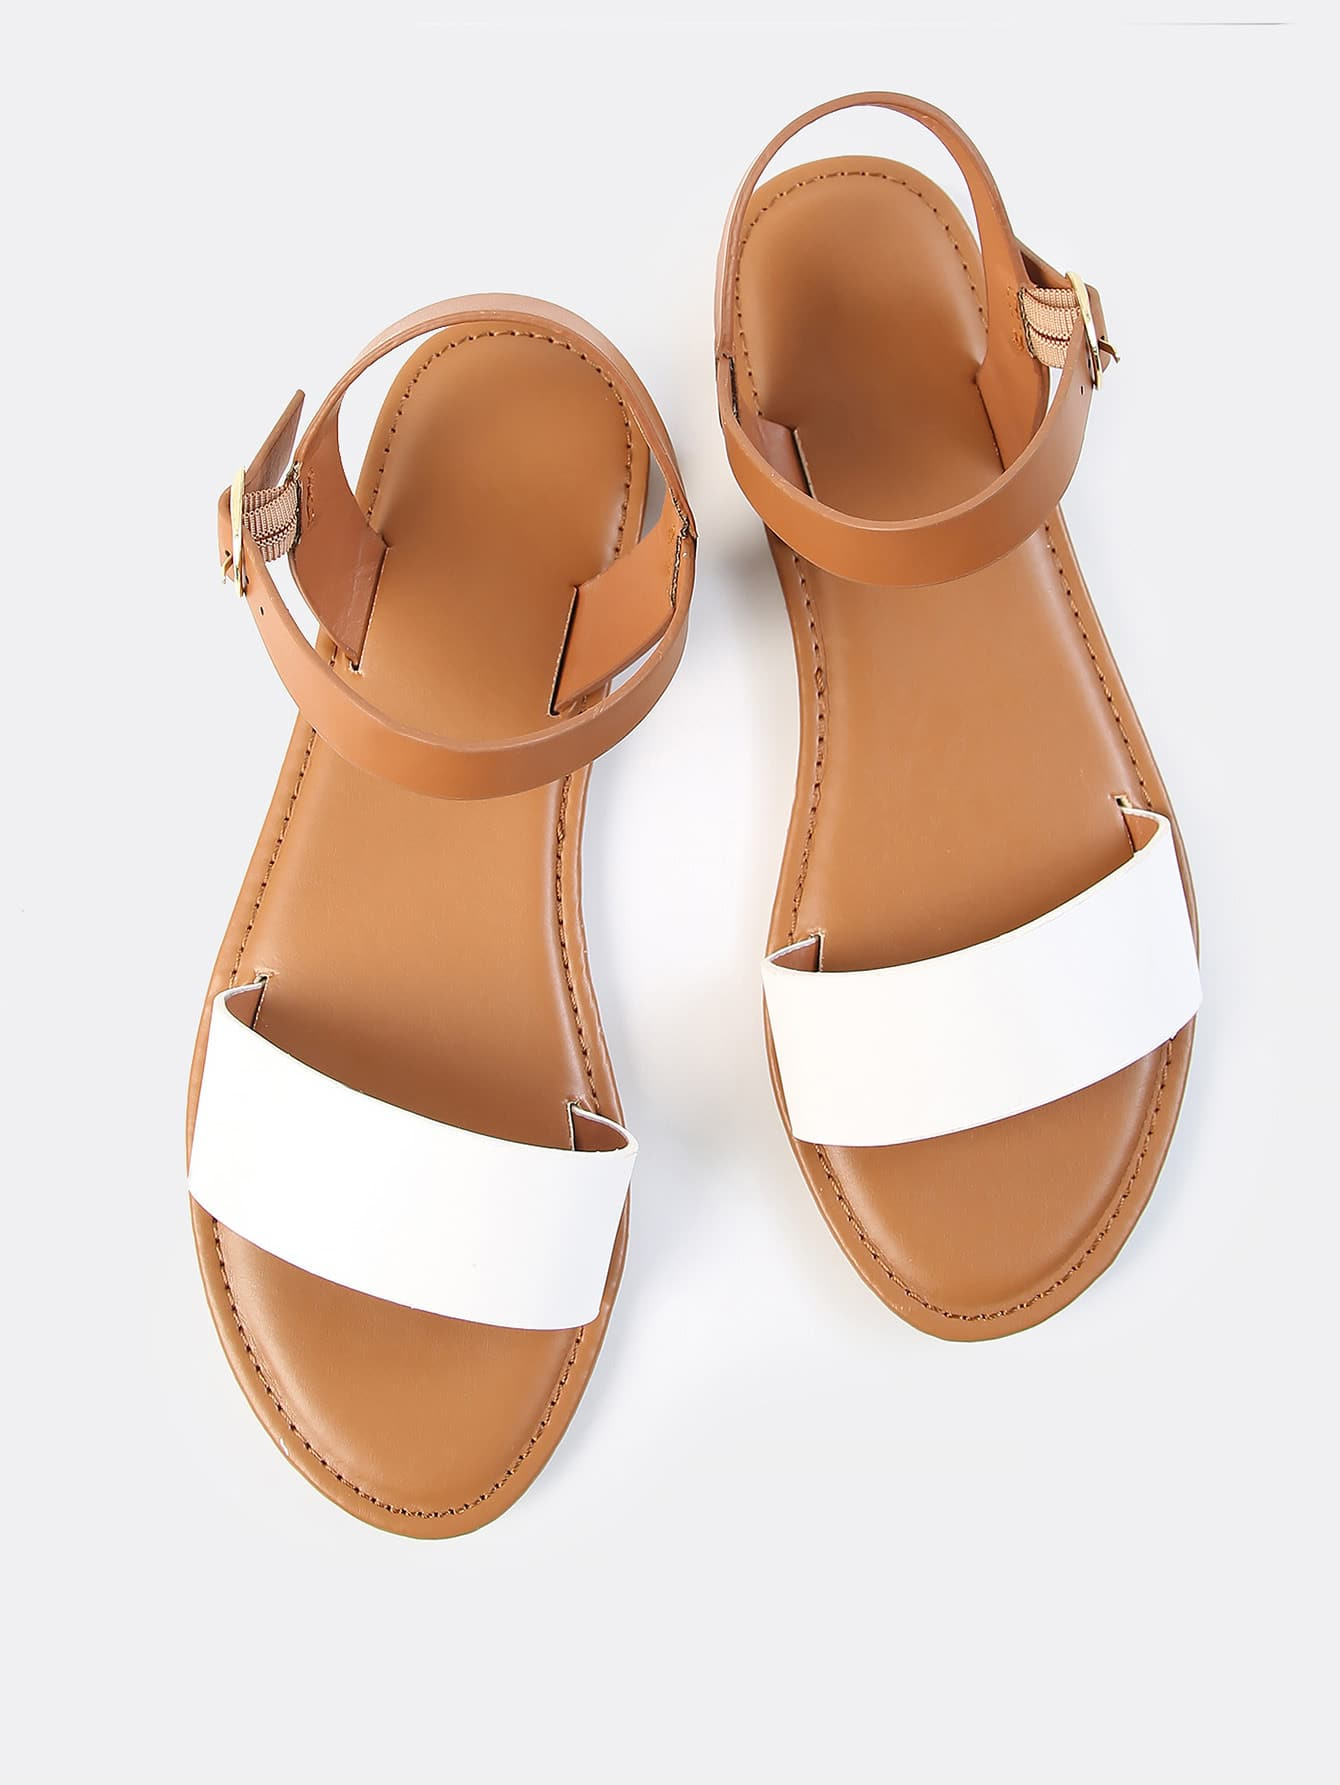 Купить со скидкой Two Tone PU Open Toe Sandals